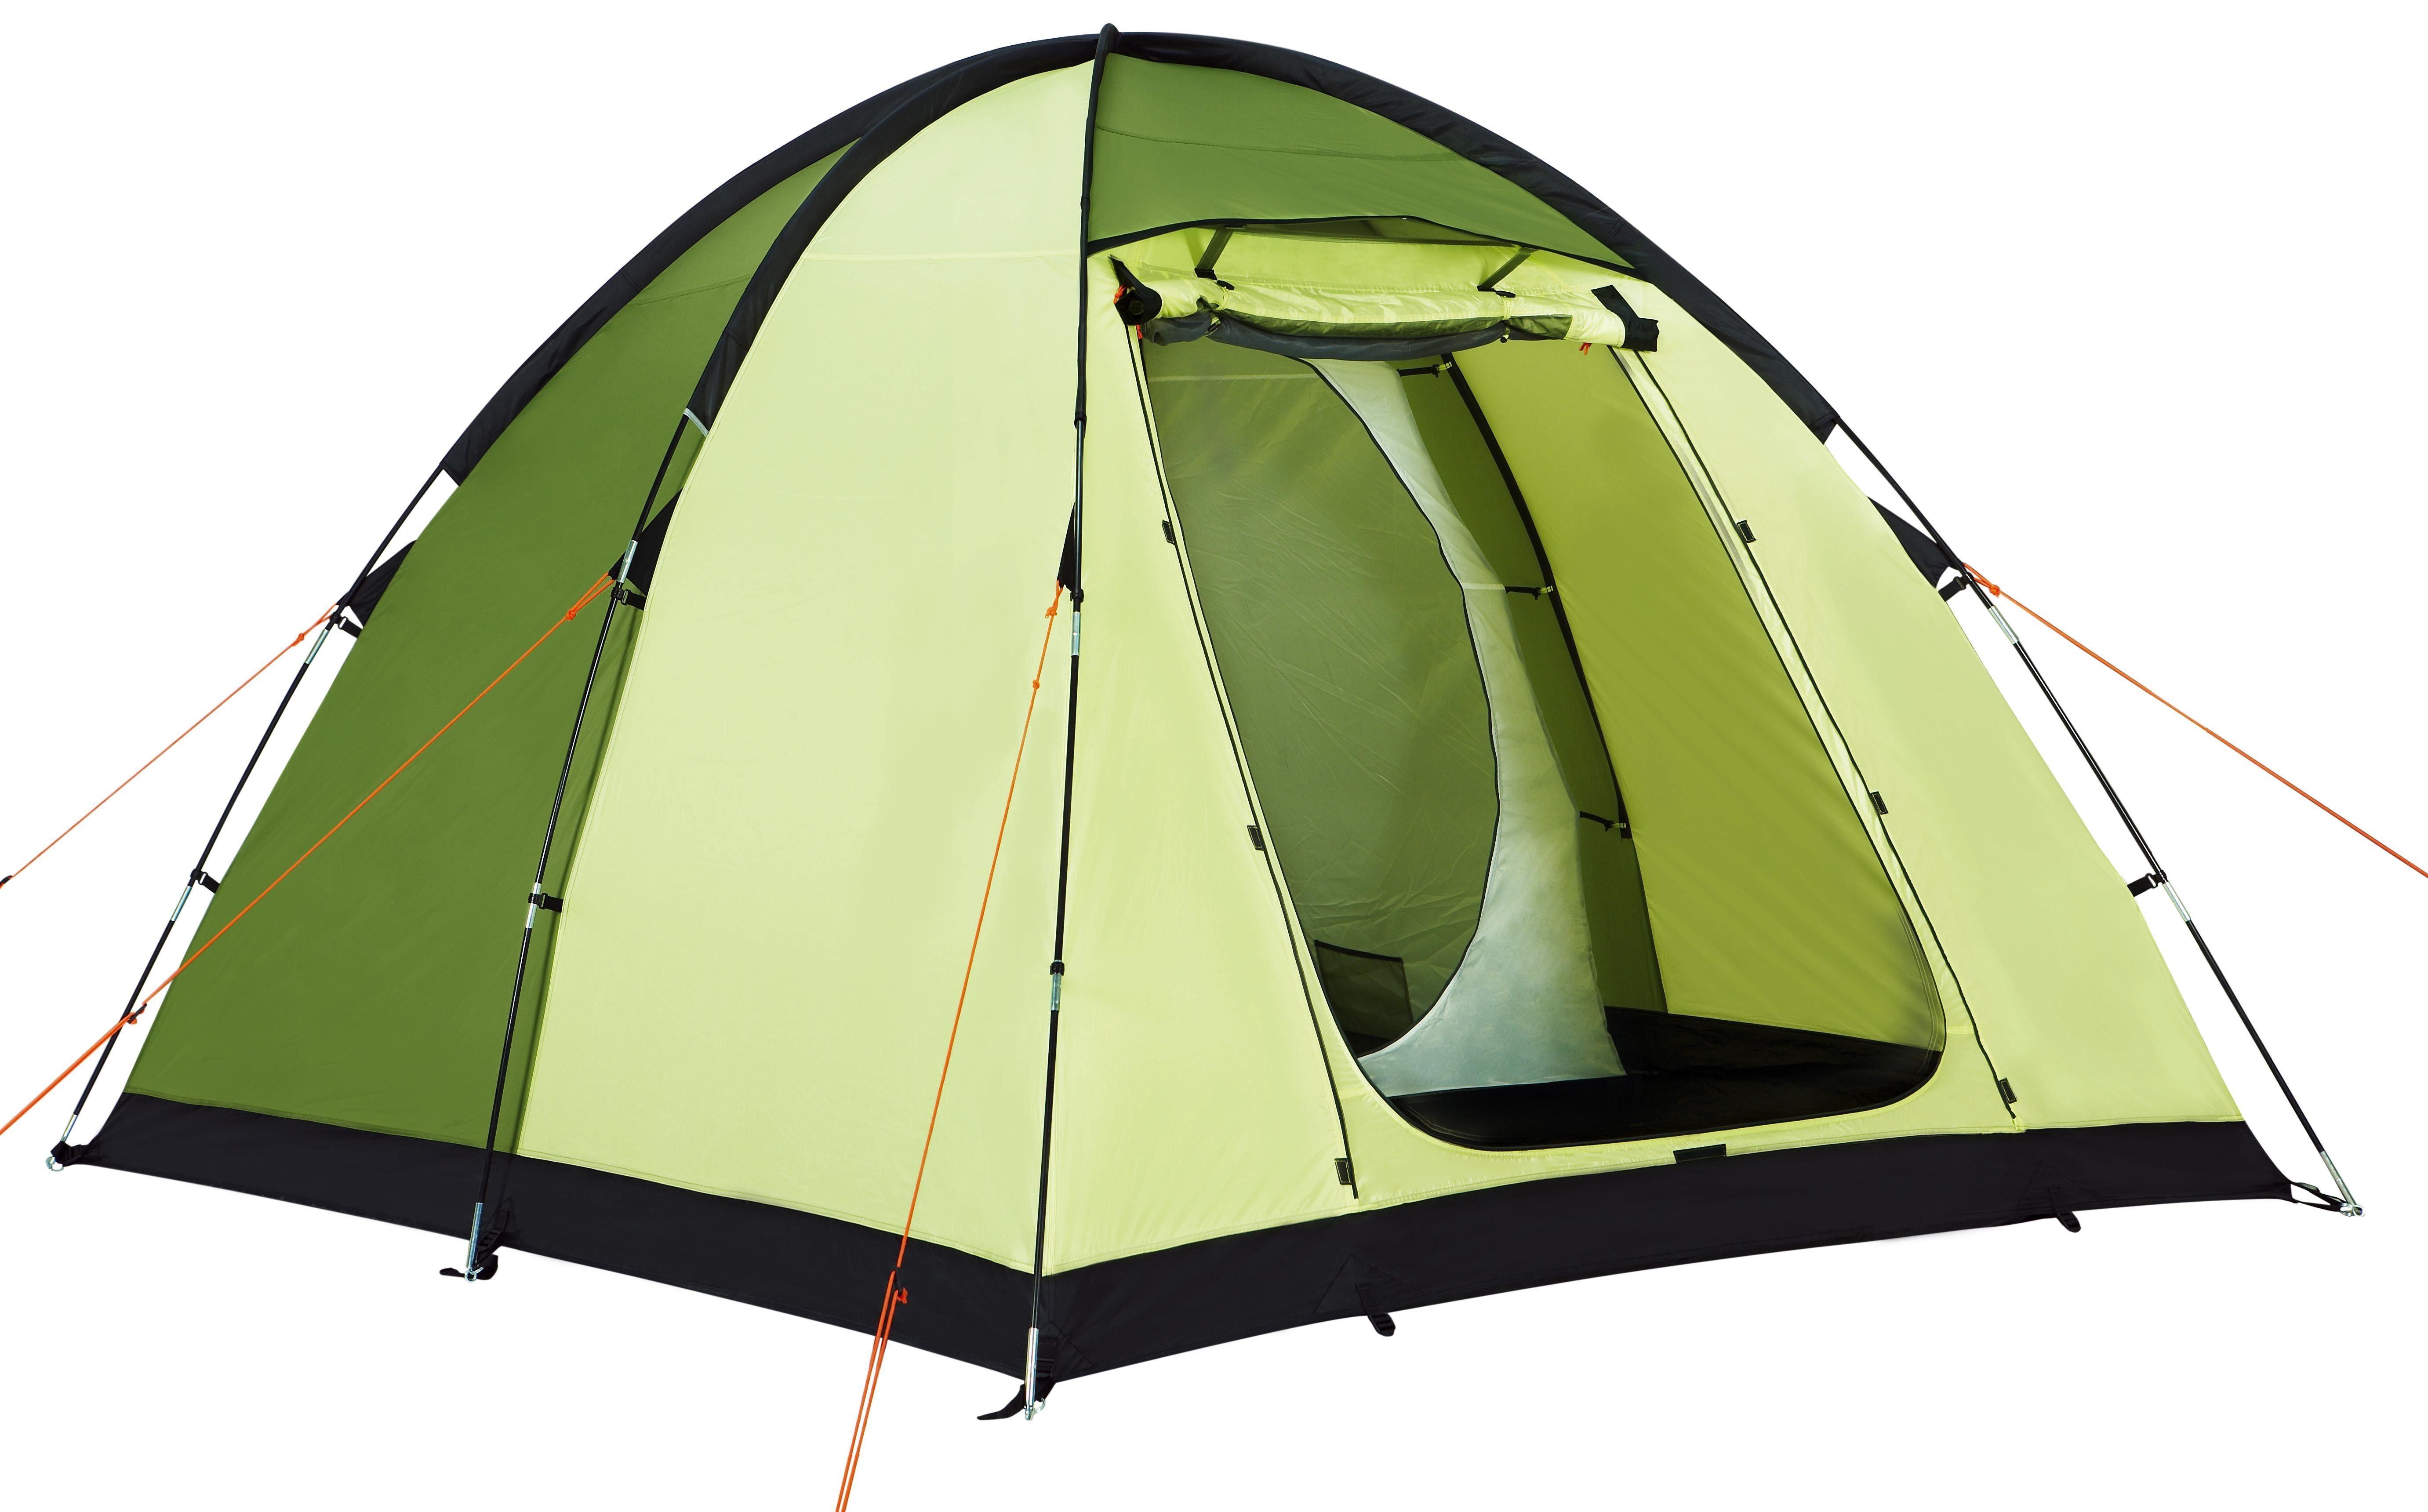 tent - Google Search  sc 1 st  Pinterest & tent - Google Search | Props | Pinterest